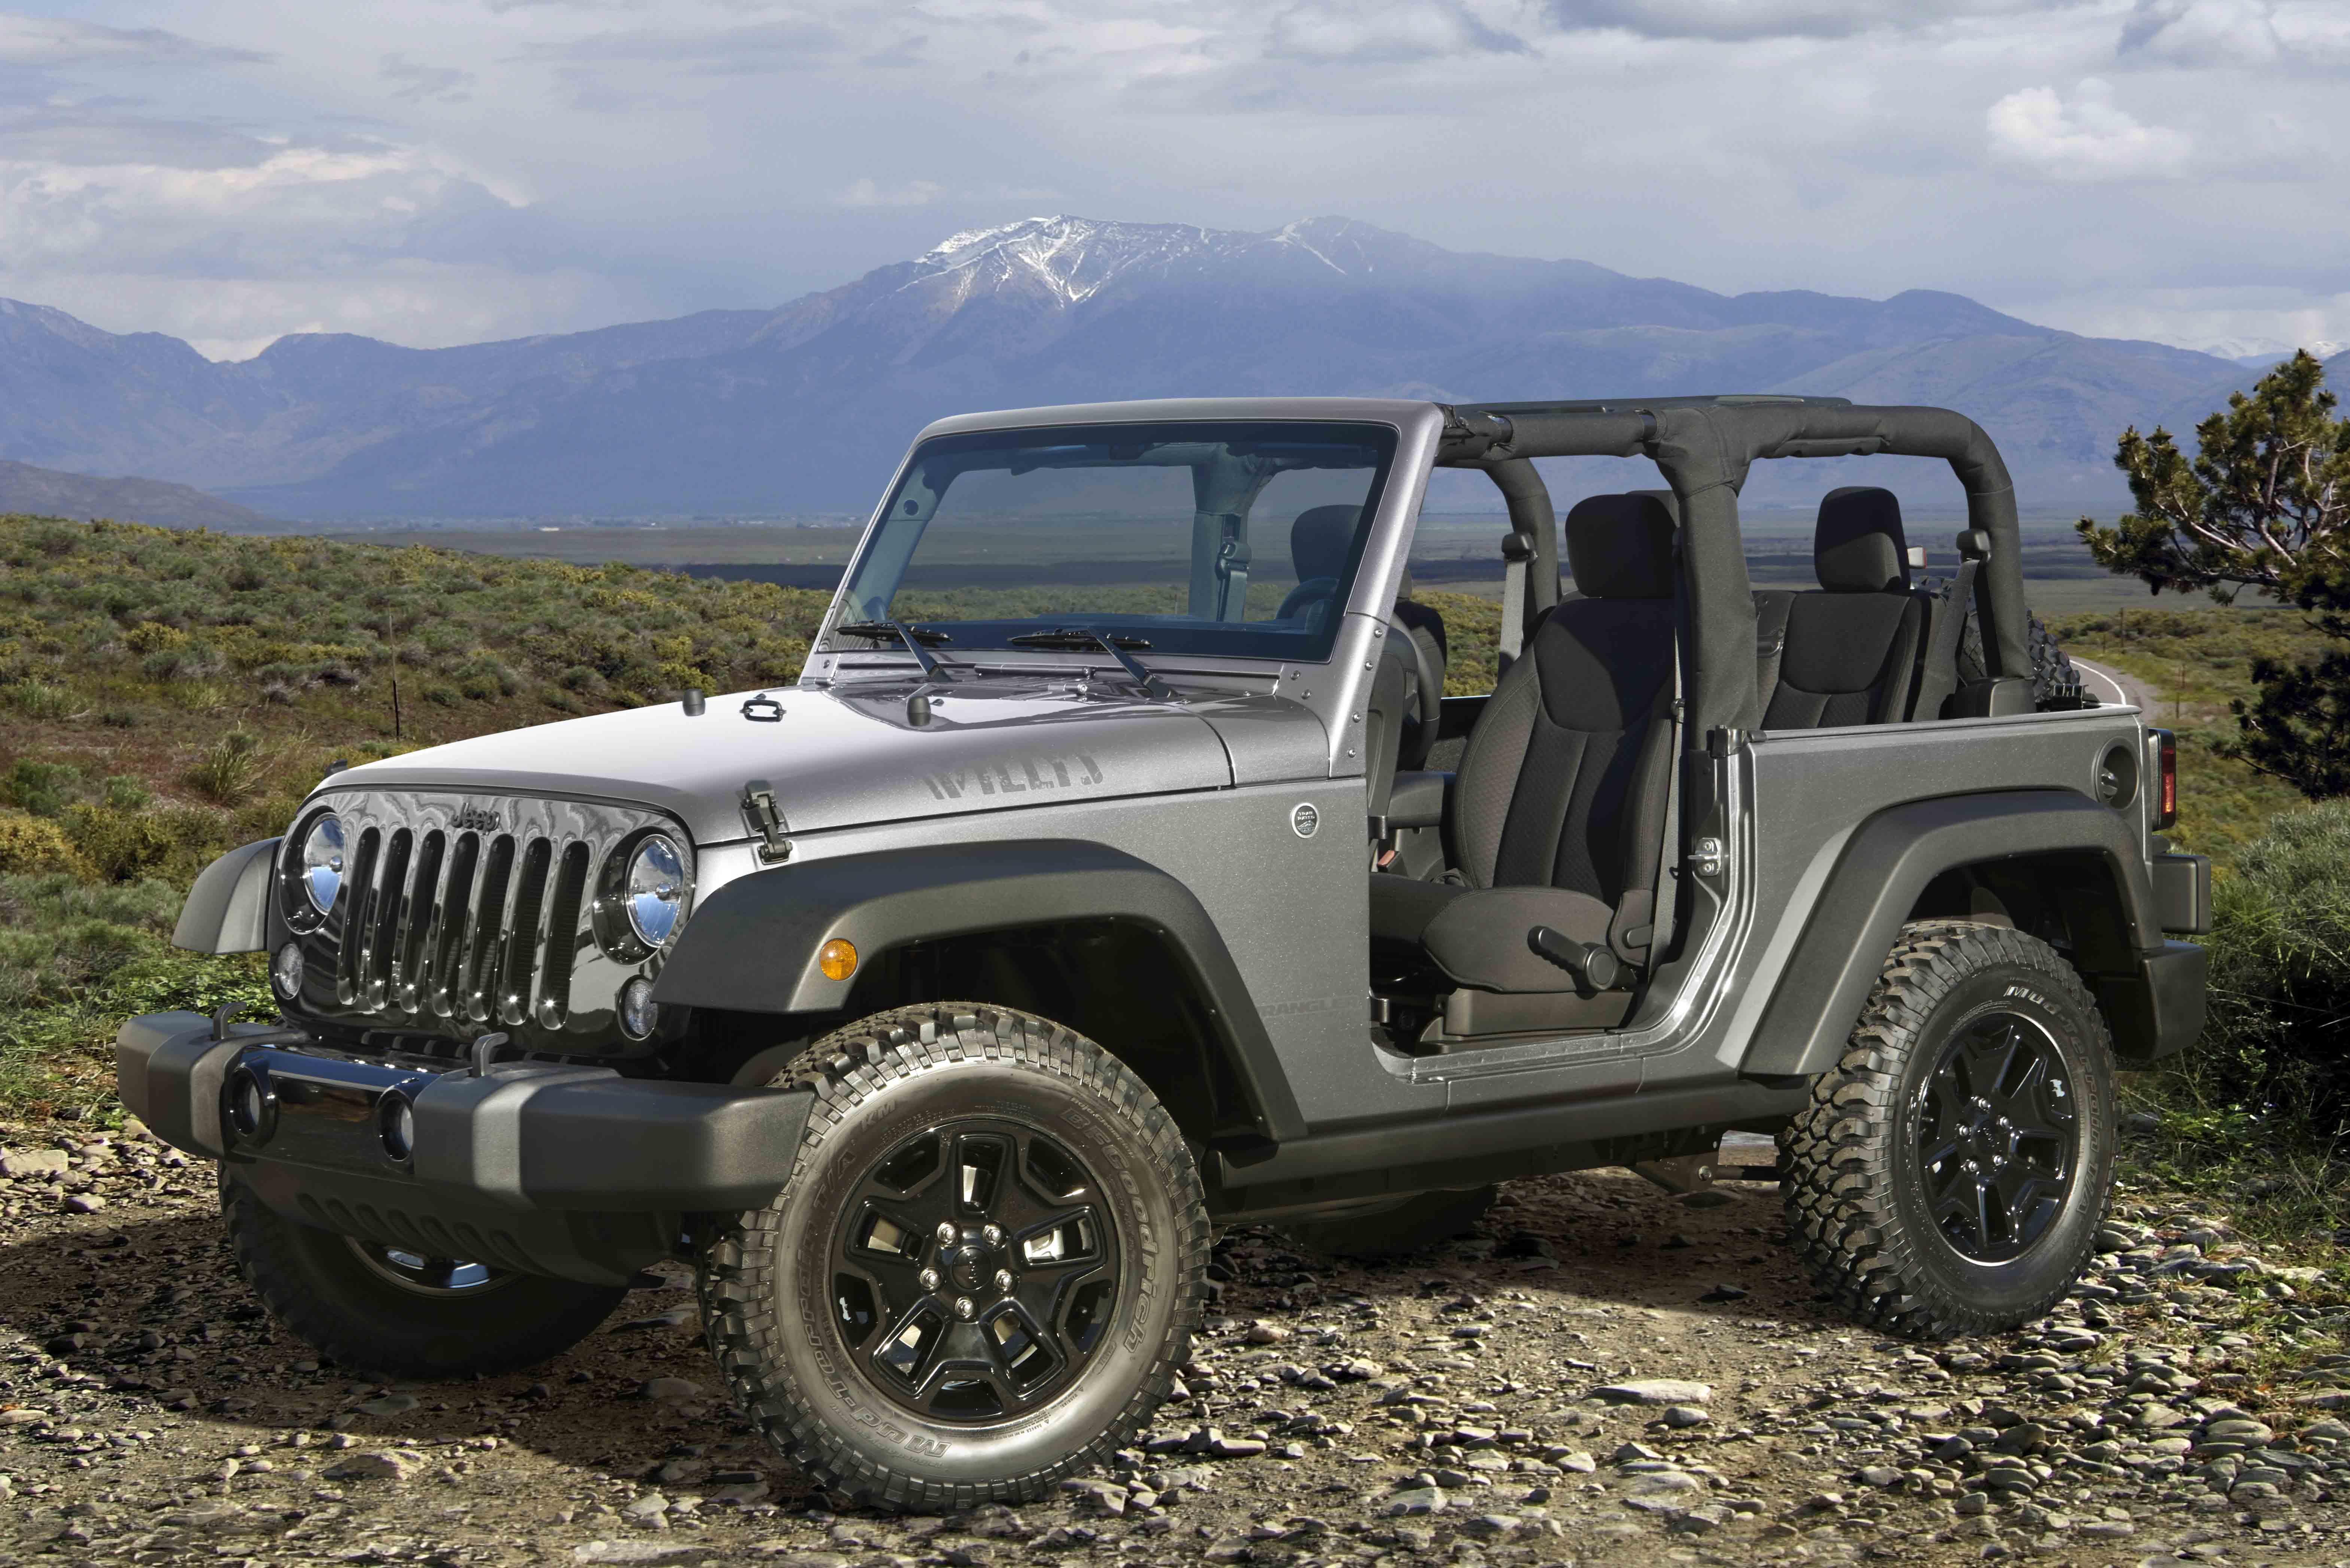 Jeep Wrangler Lease >> Jeep Suv Dealership Superior Wi Superior Chrysler Dodge